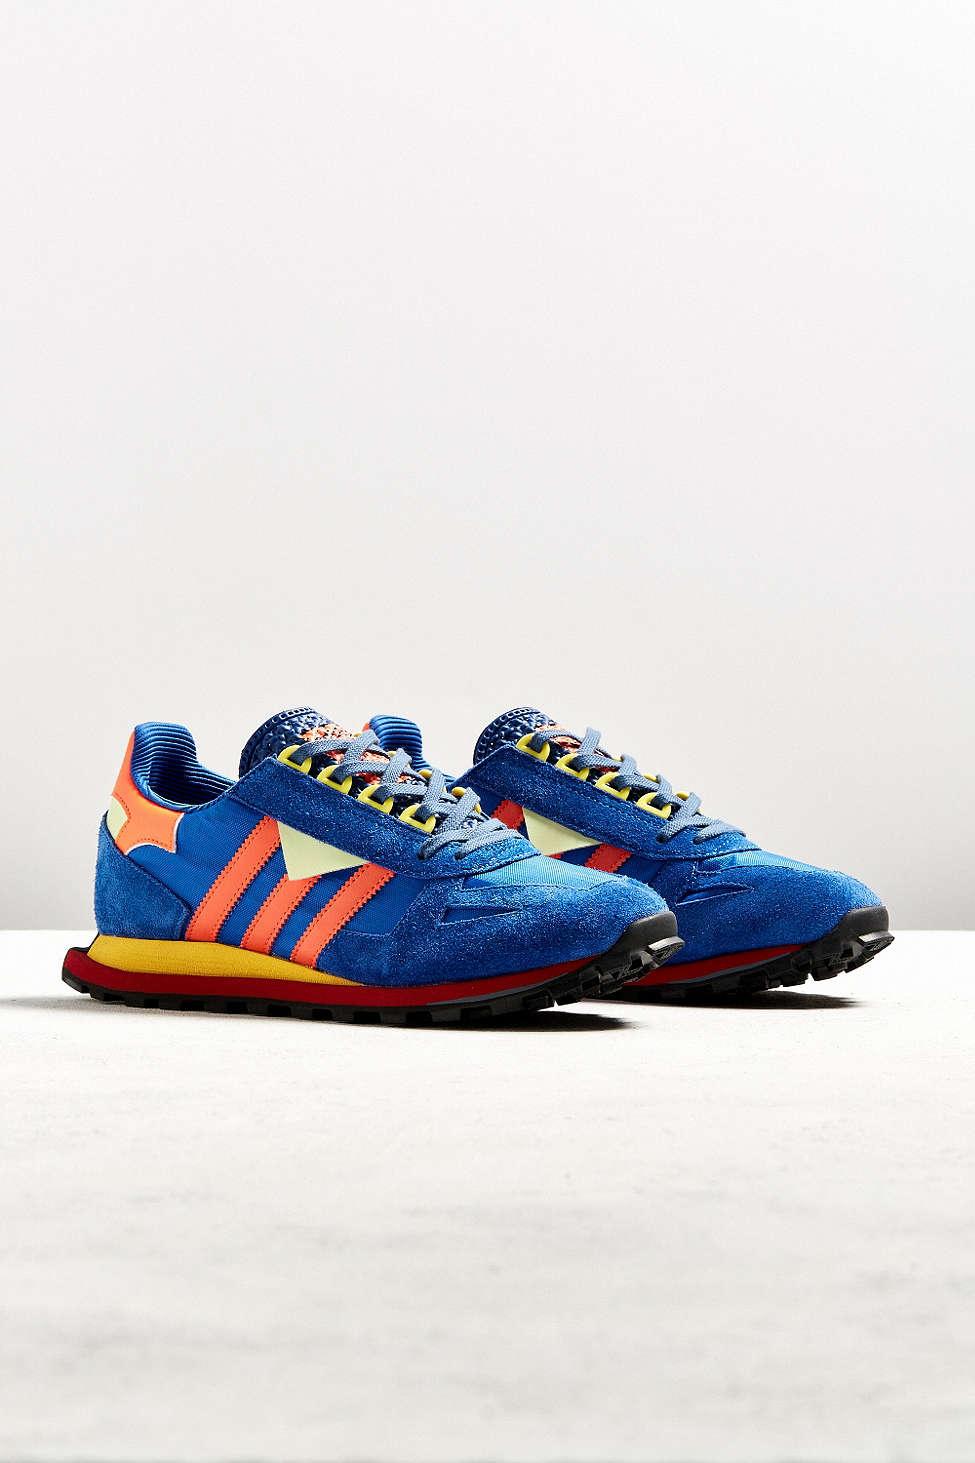 adidas-prototype-racing-1-sneaker-1